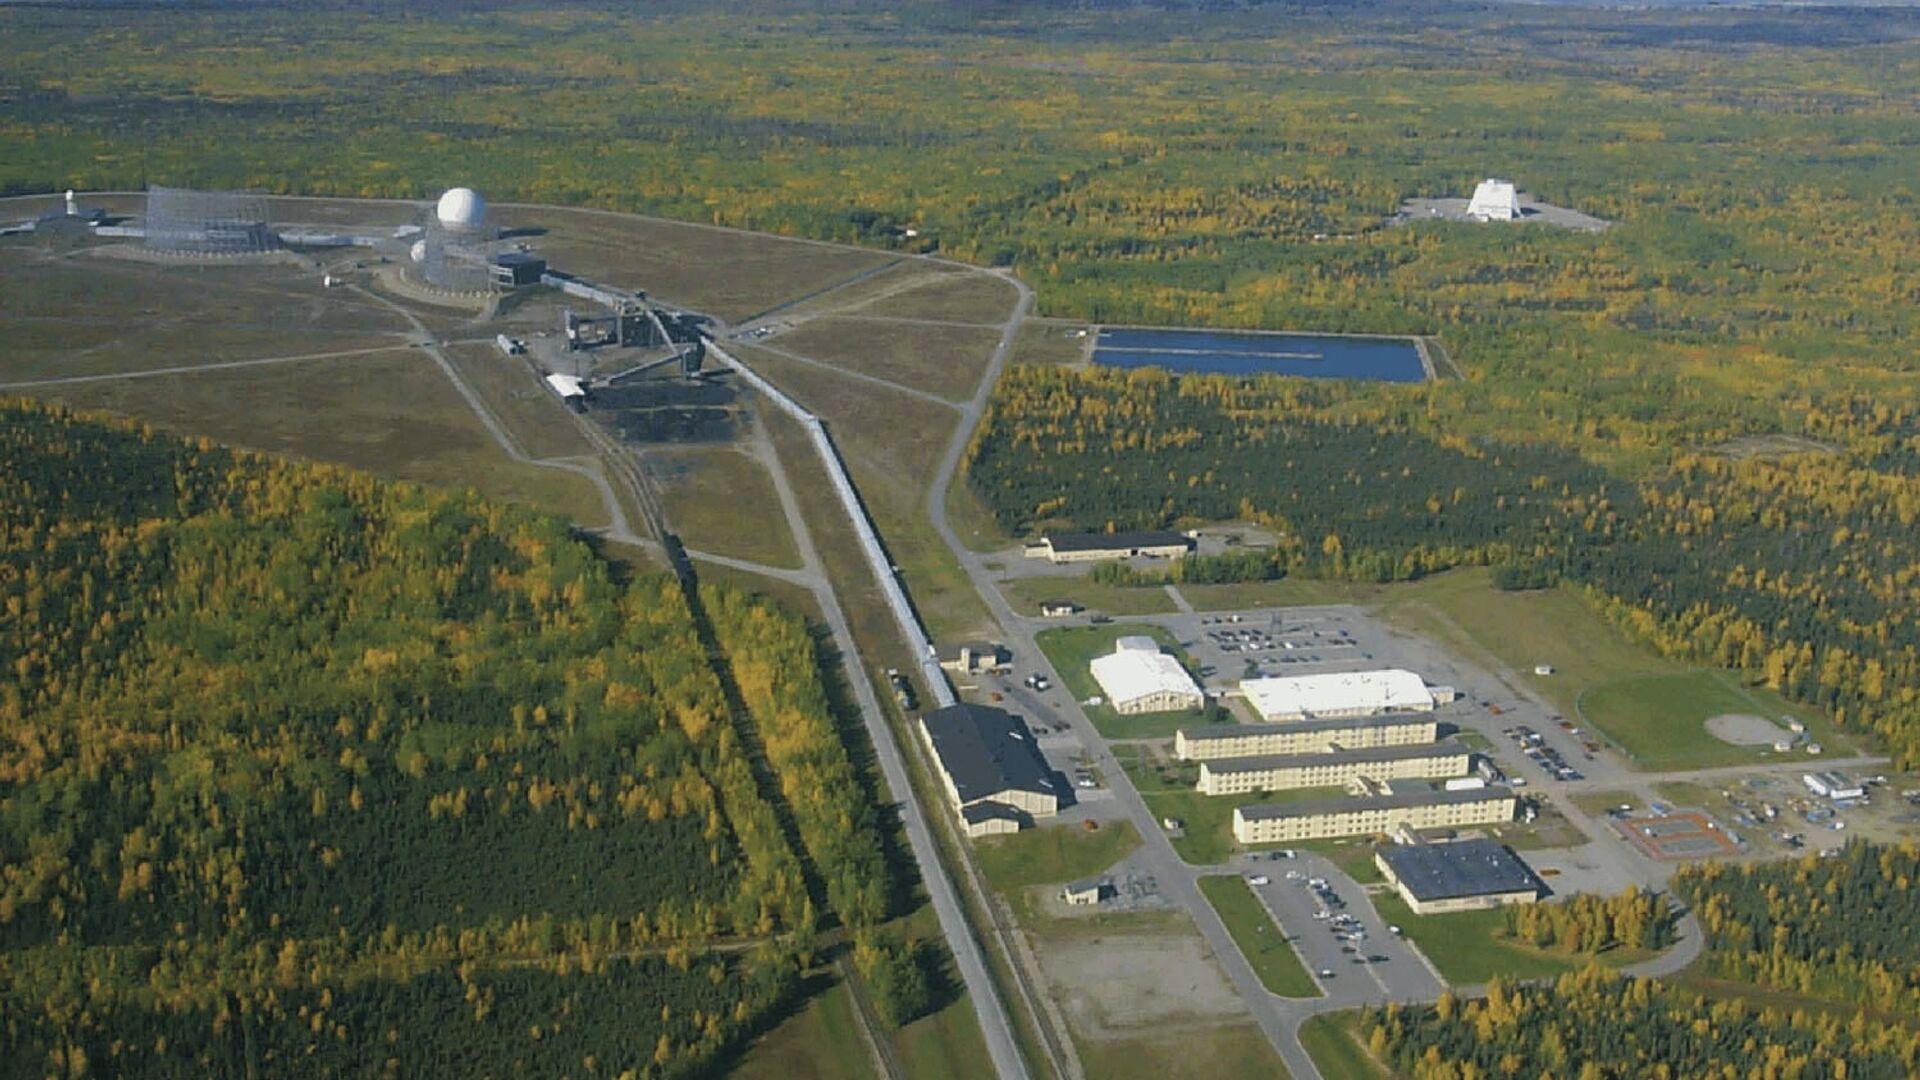 US Air Force Clear Air Force Station na Alasce - Sputnik Polska, 1920, 18.07.2021